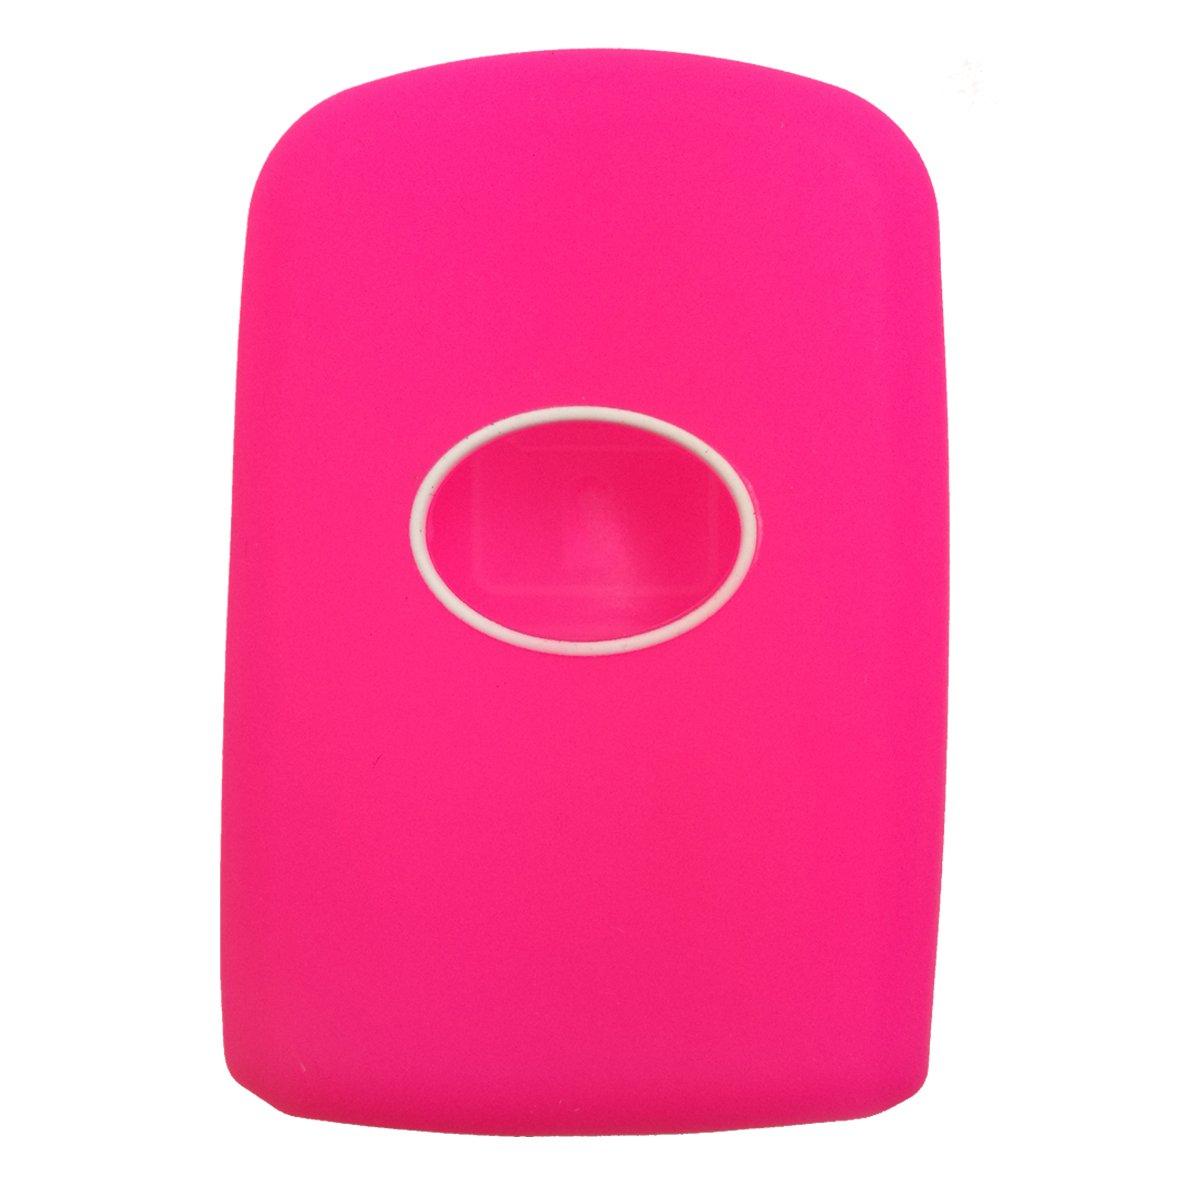 Alegender Hand Sew Leather Remote Key Fob Cover Case Protector Holder Skin Jacket for 2014 2015 2016 Toyota Highlander RAV4 Camry Avalon Corolla 4 Buttons Smart Key